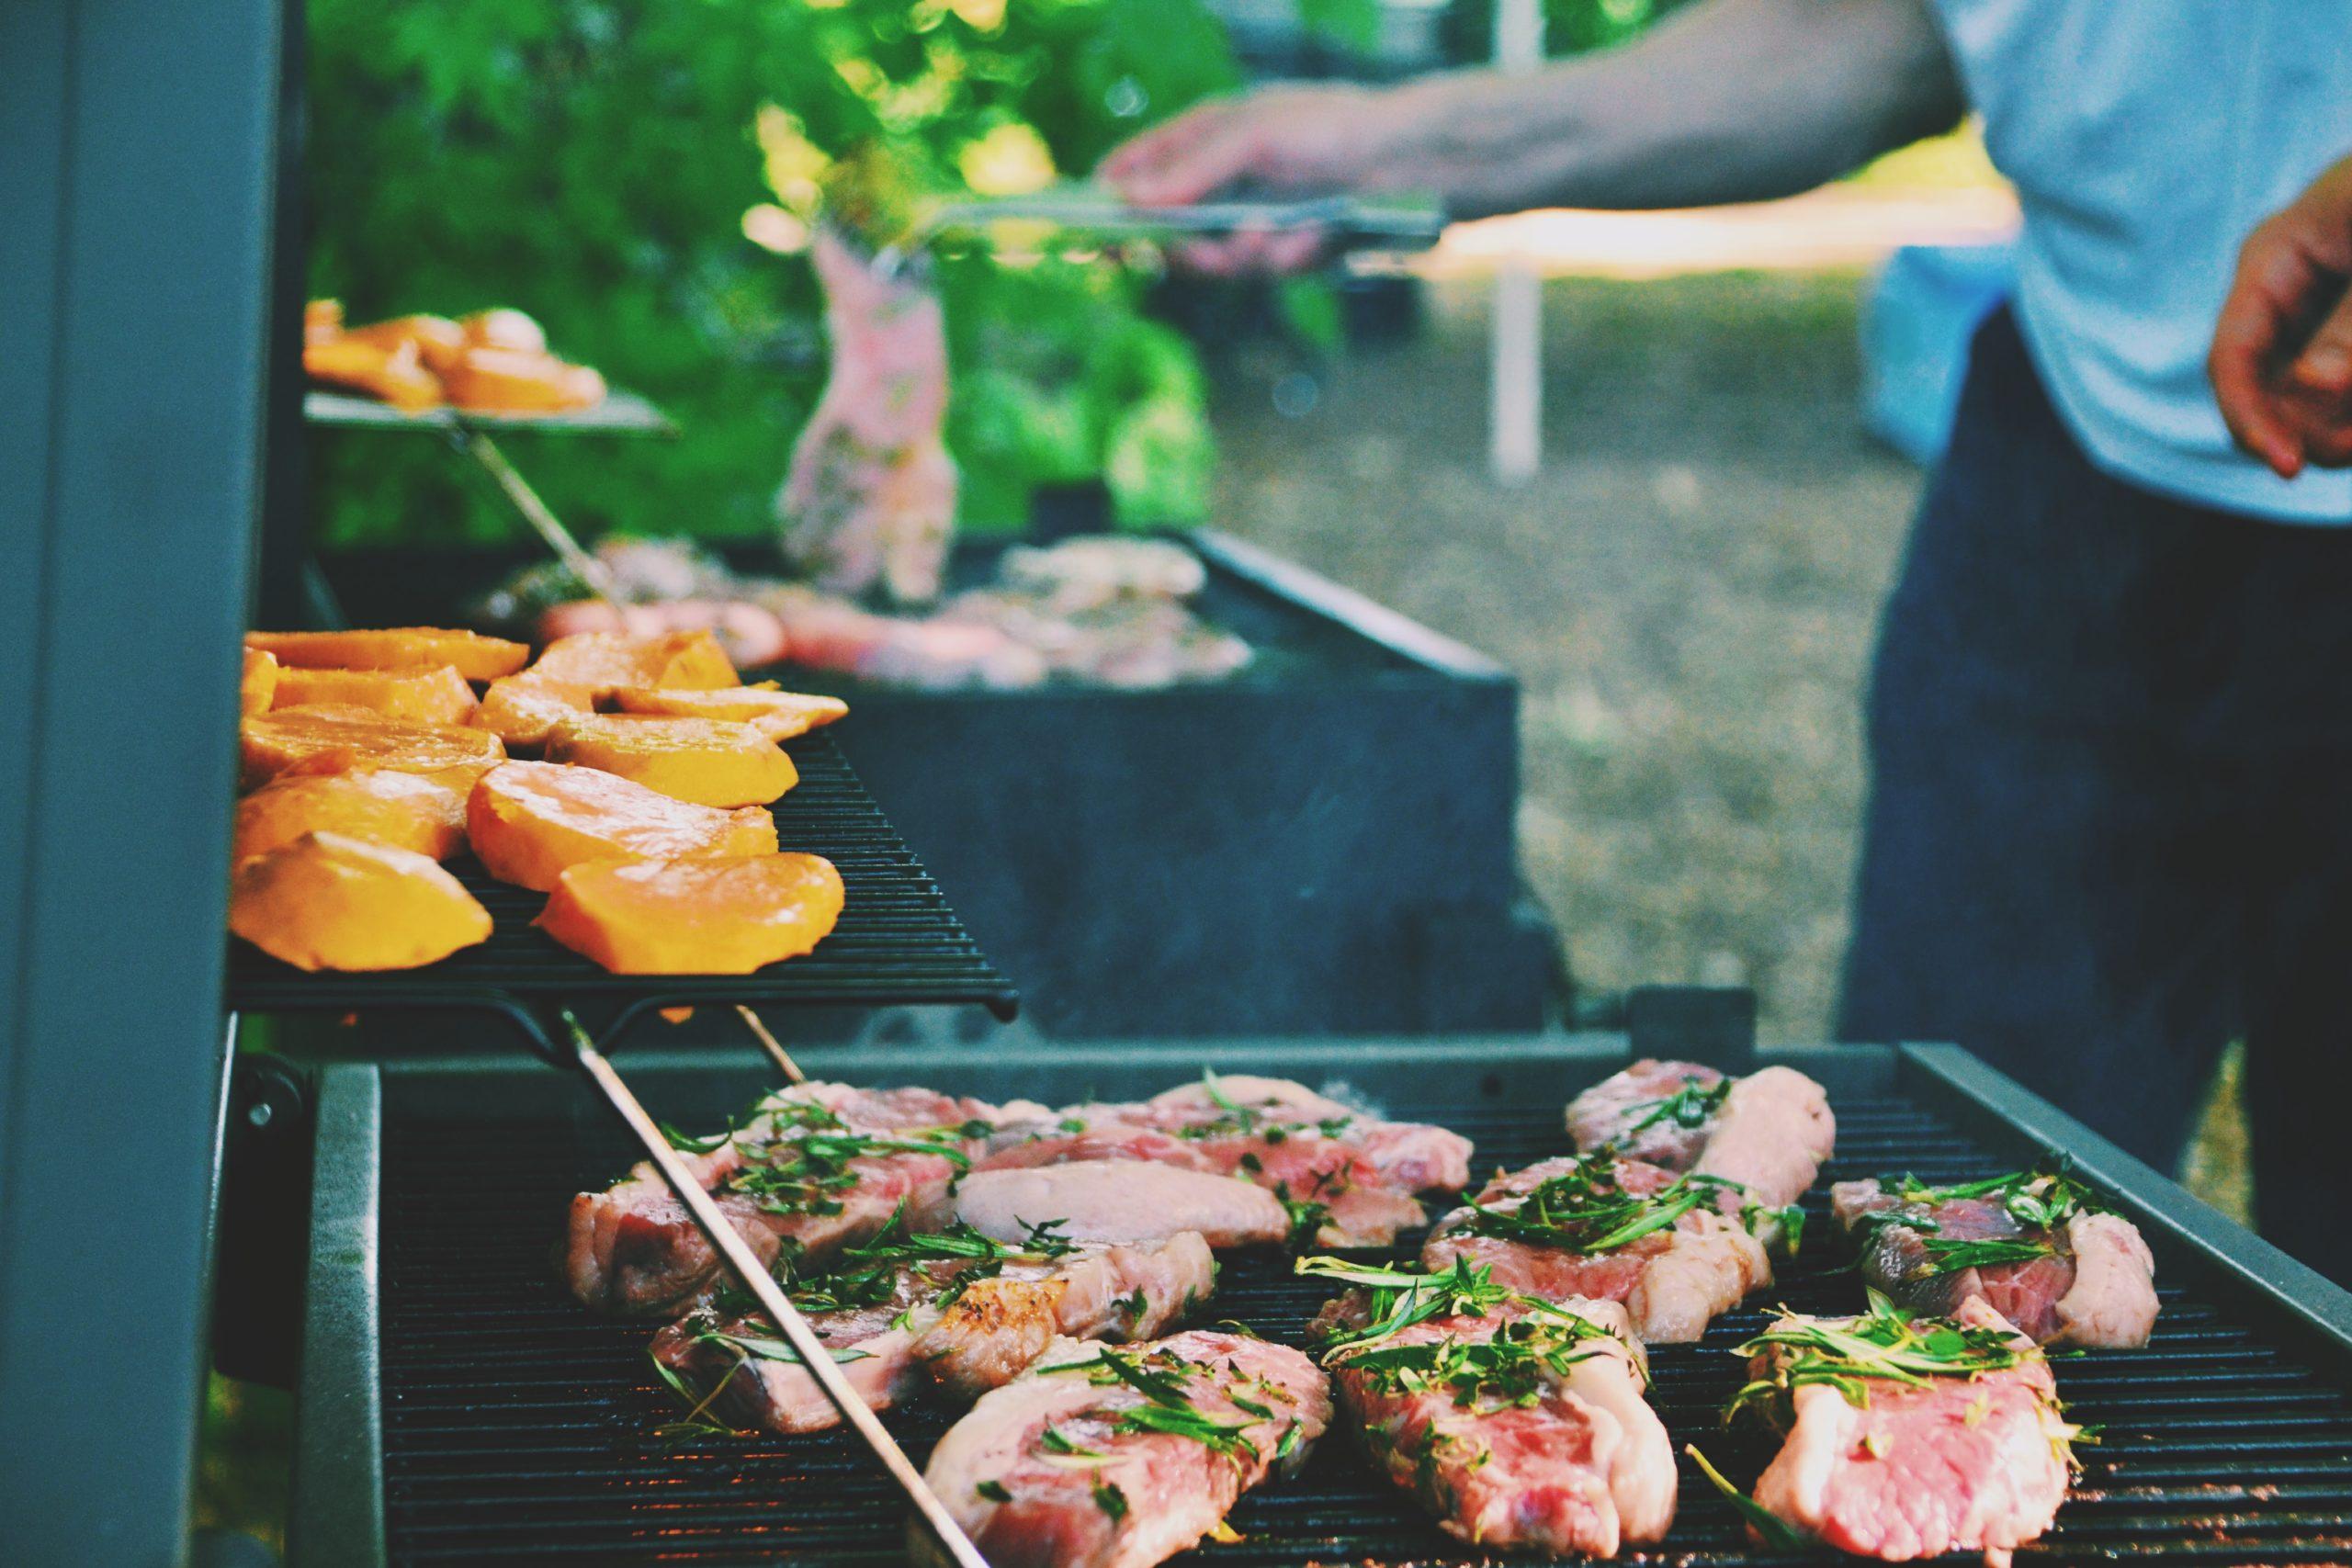 Best Smokeless Charcoal BBQ UK 2020